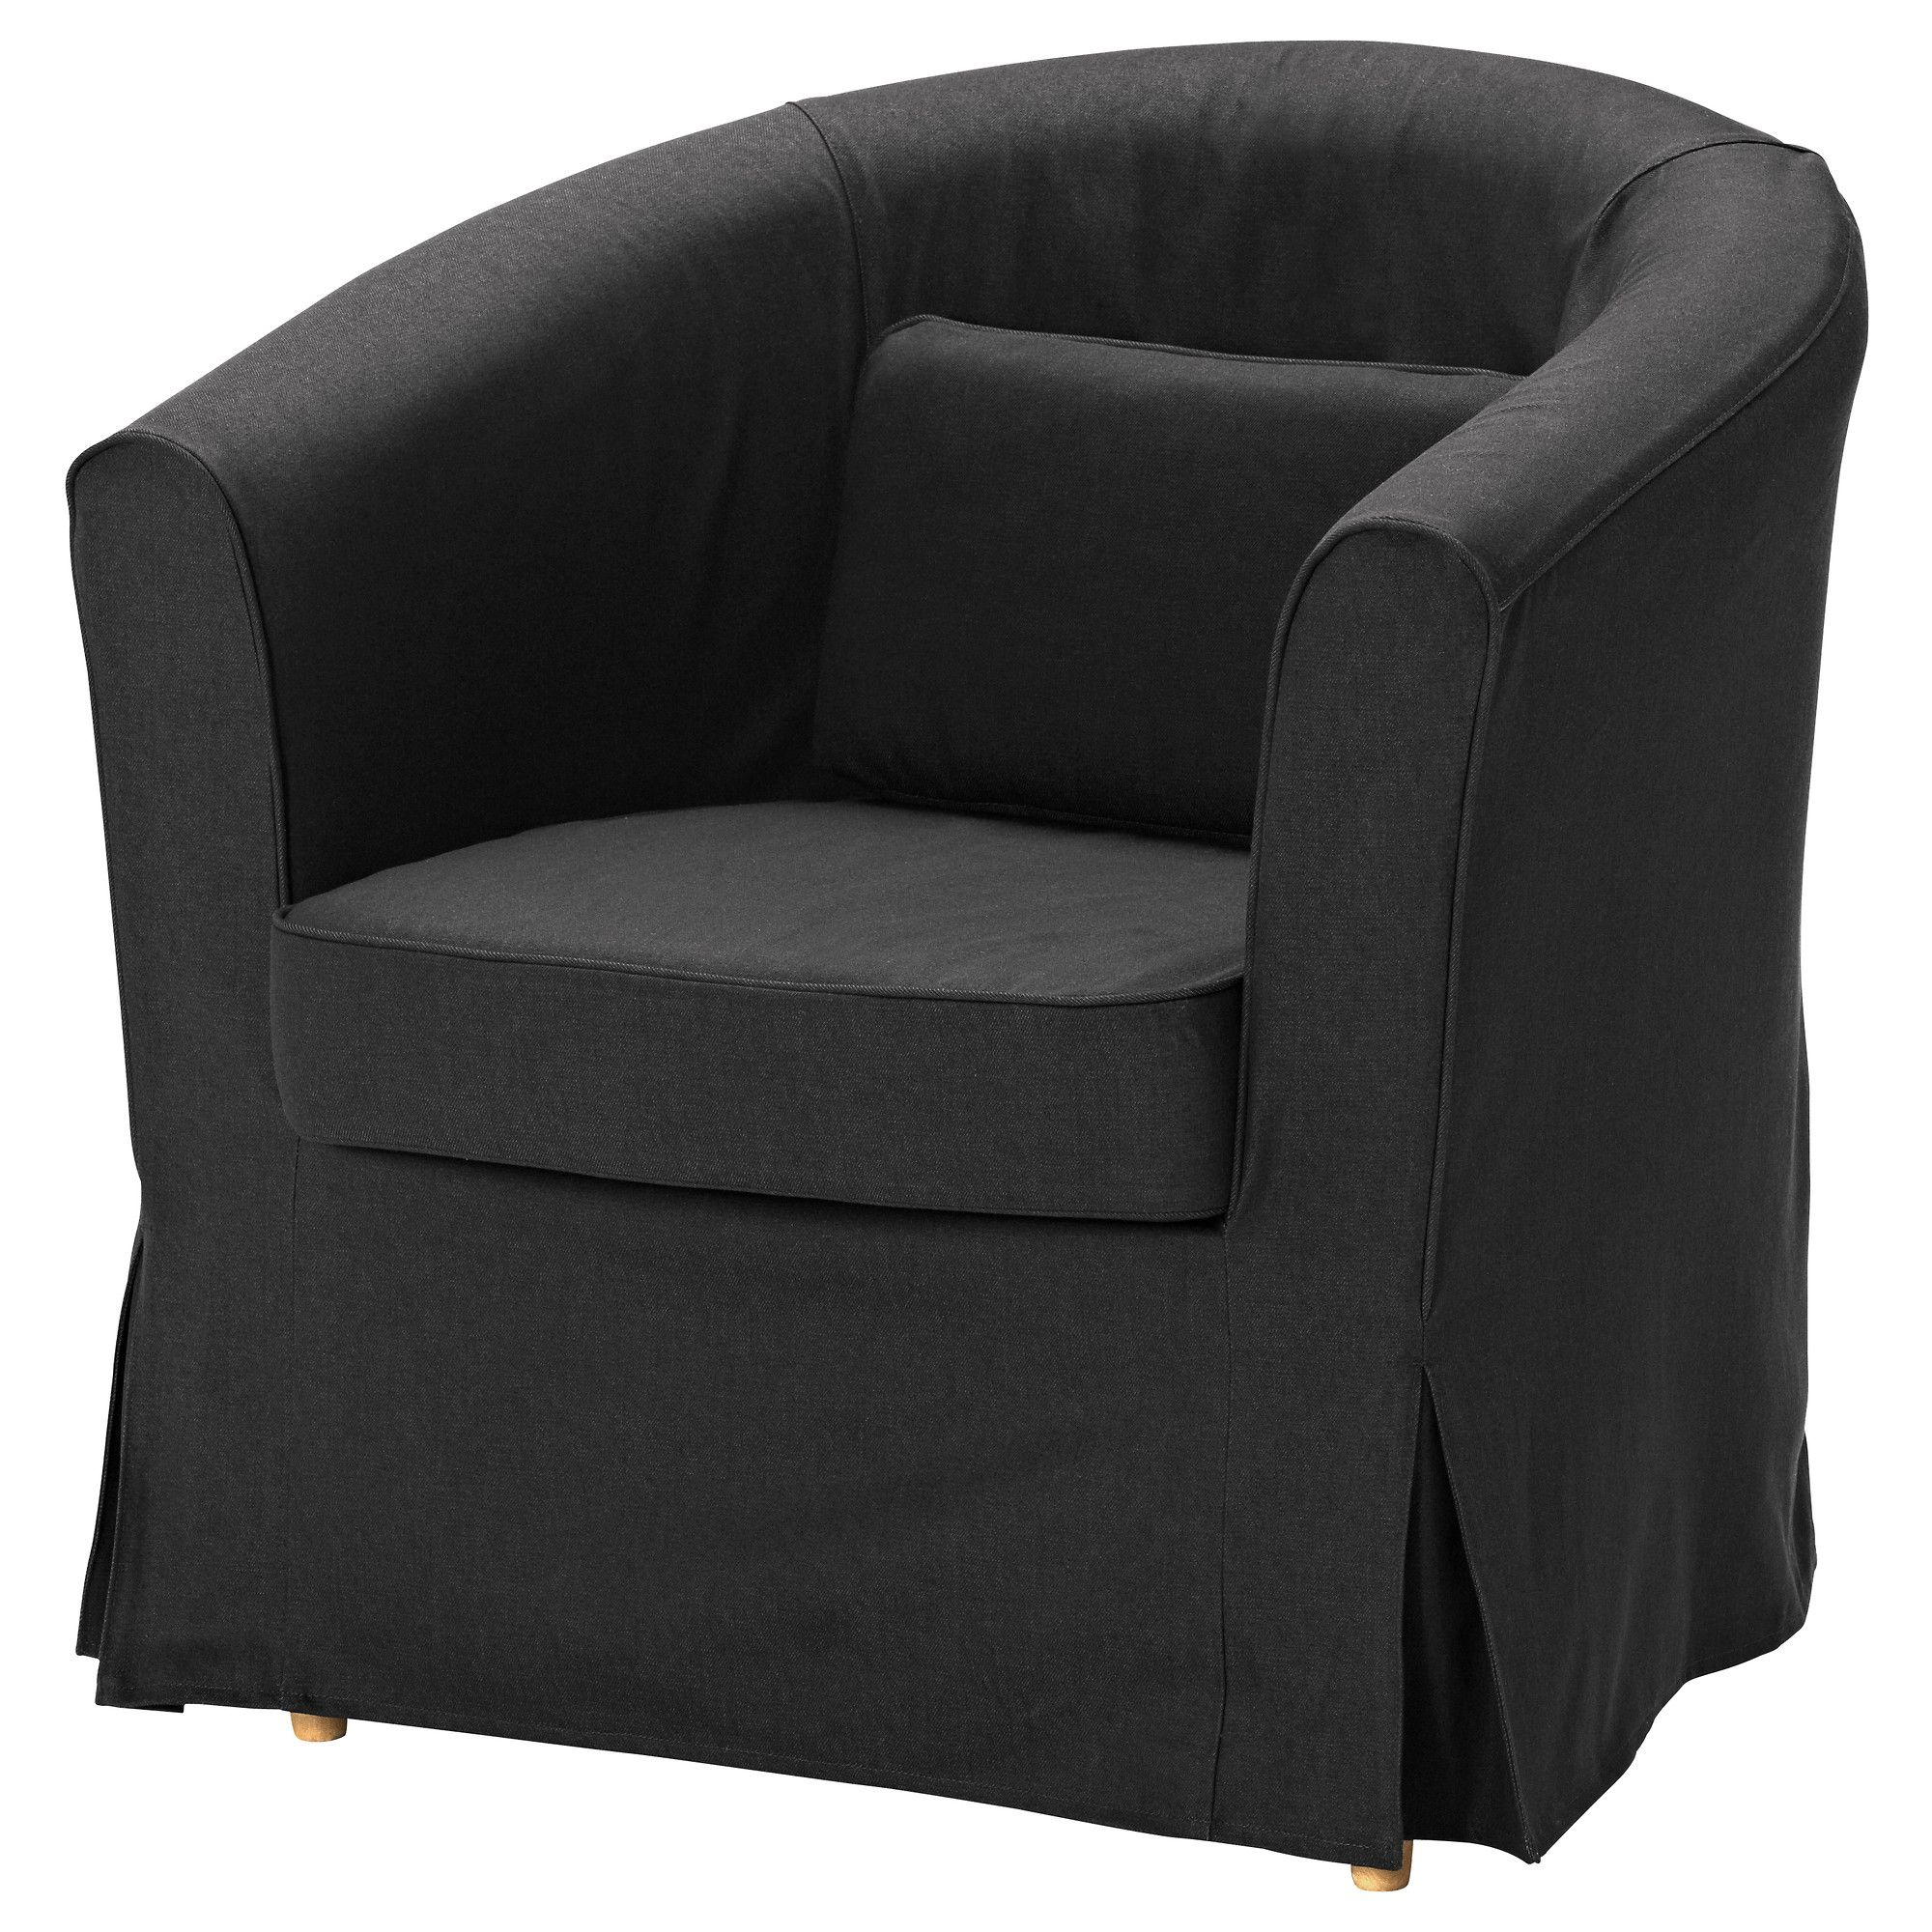 Furniture And Home Furnishings Ikea Armchair Ikea Chair